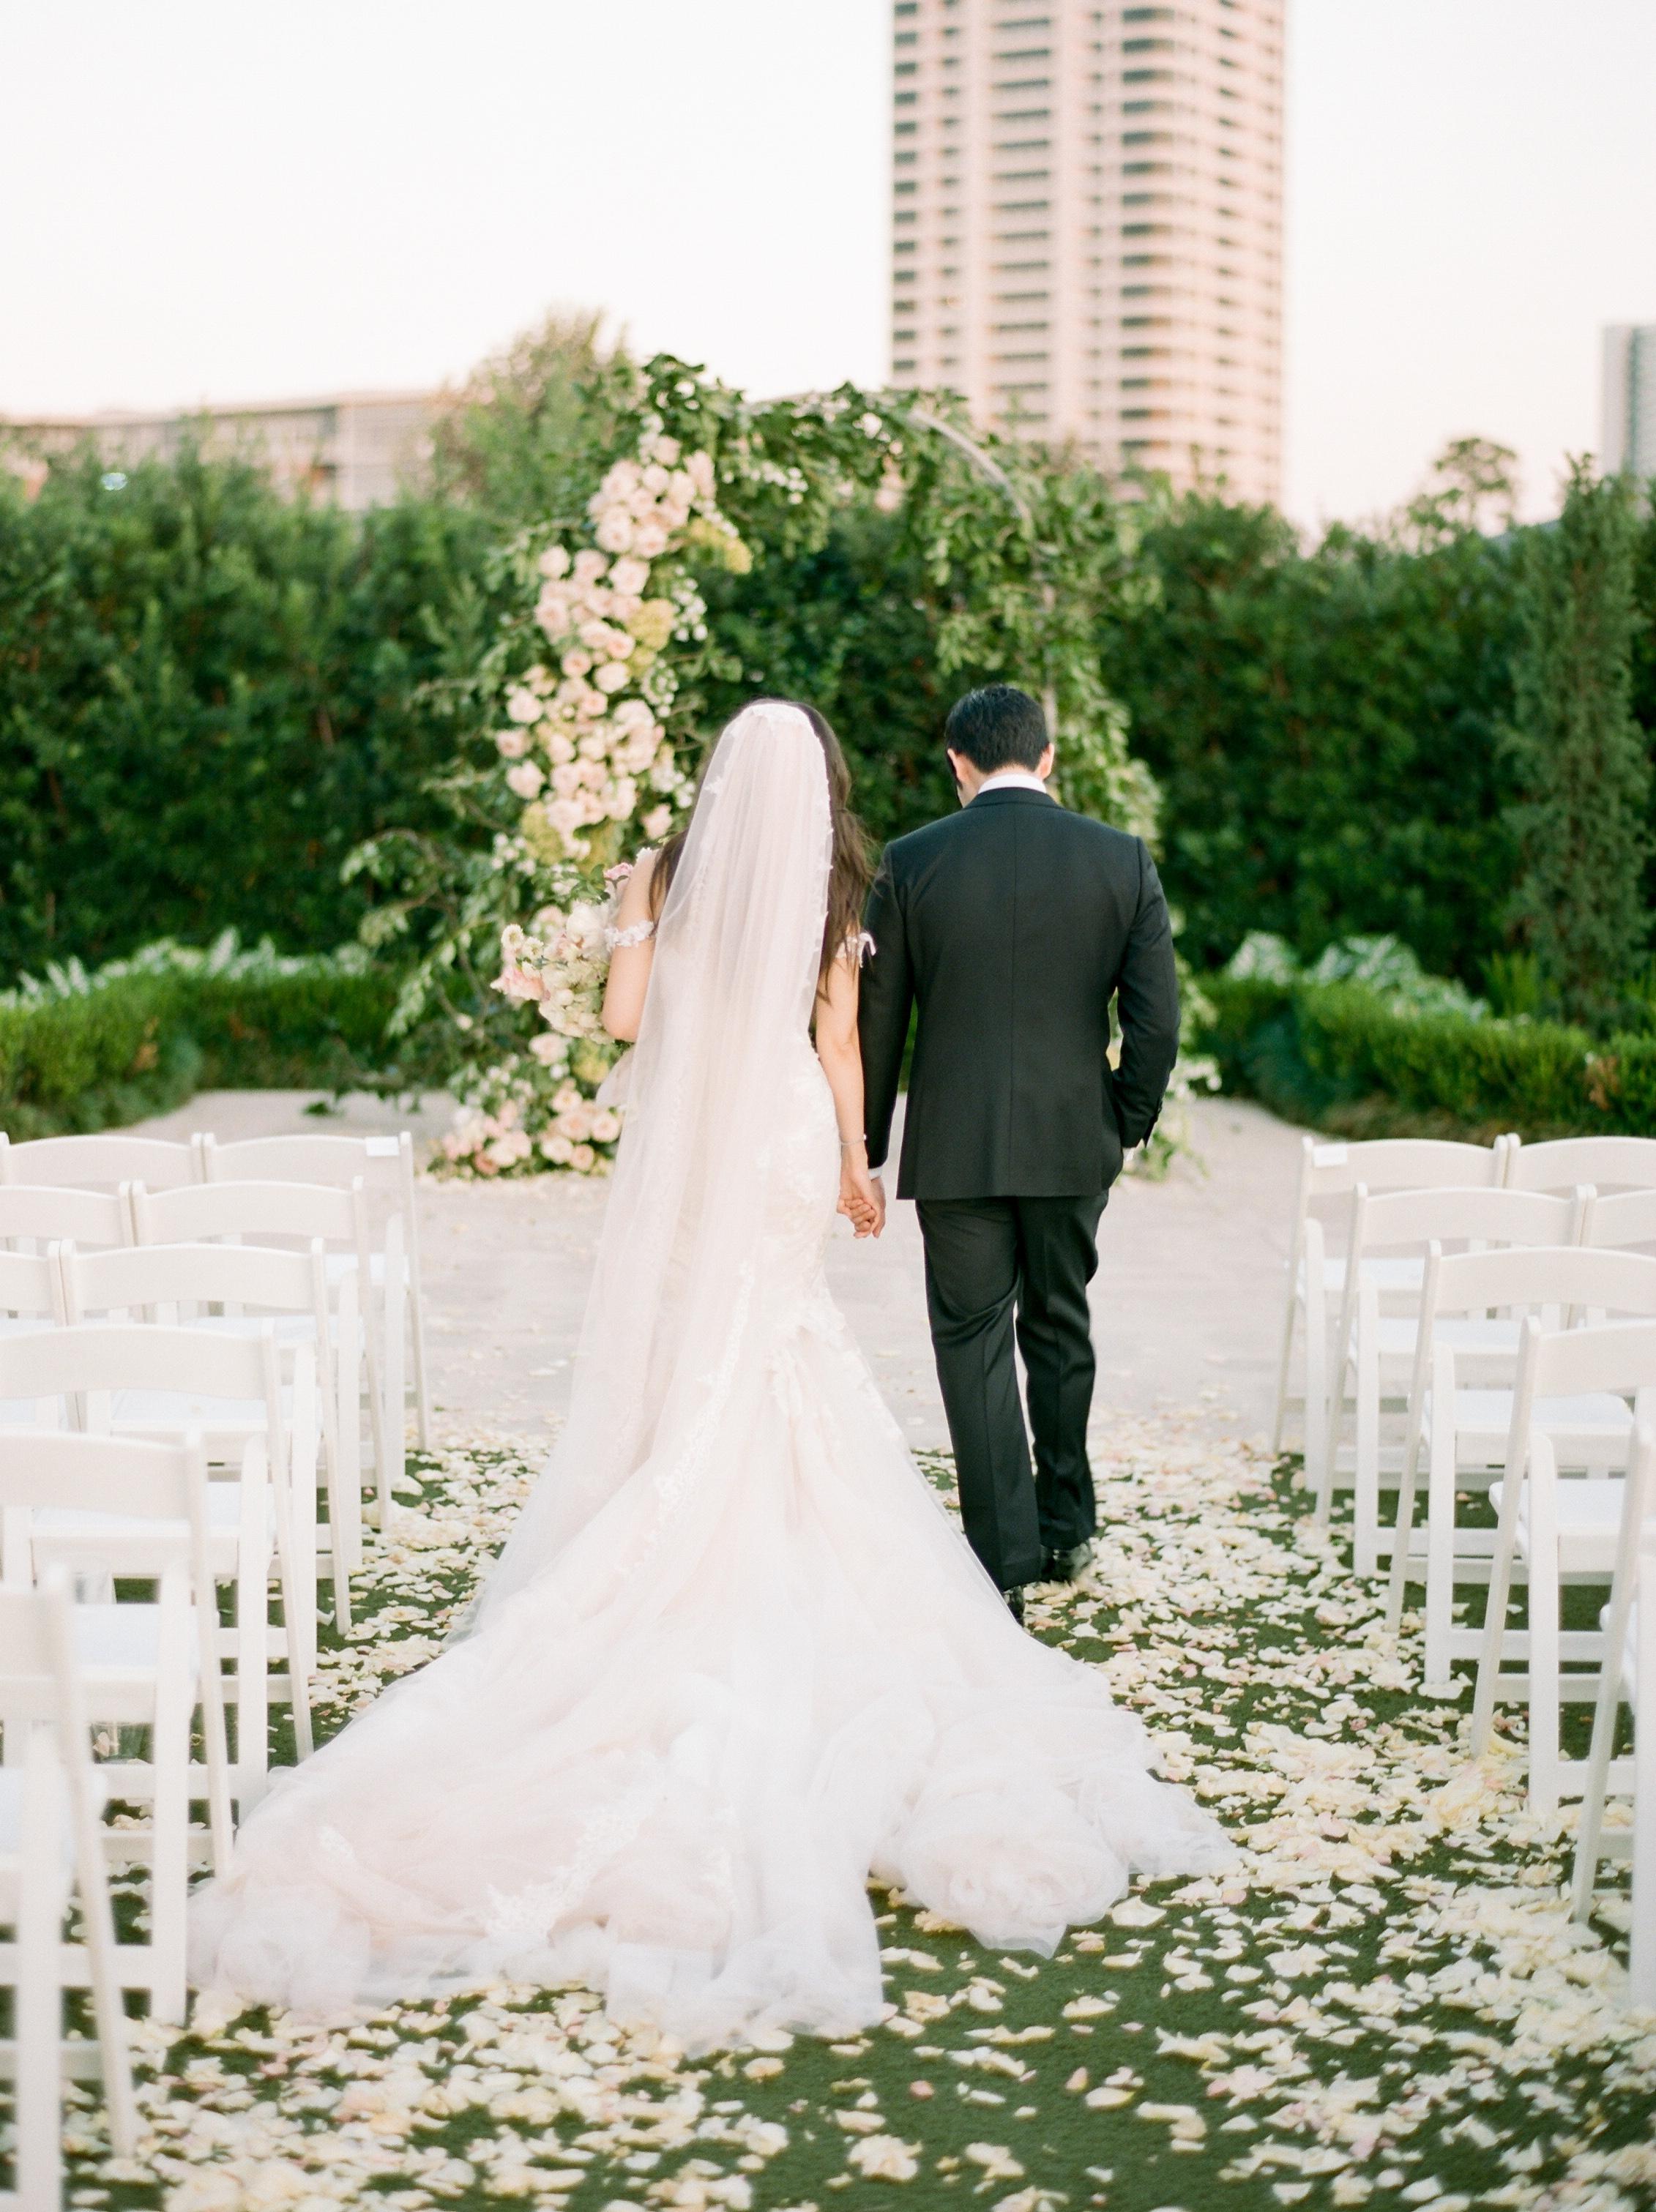 Martha-Stewart-Wedding-Dana-Fernandez-Photography-Josh-Texas-Film-Houston-Wedding-Fine-Art-Photographer-McGovern-Centennial-Gardens-Top-Best-71.jpg